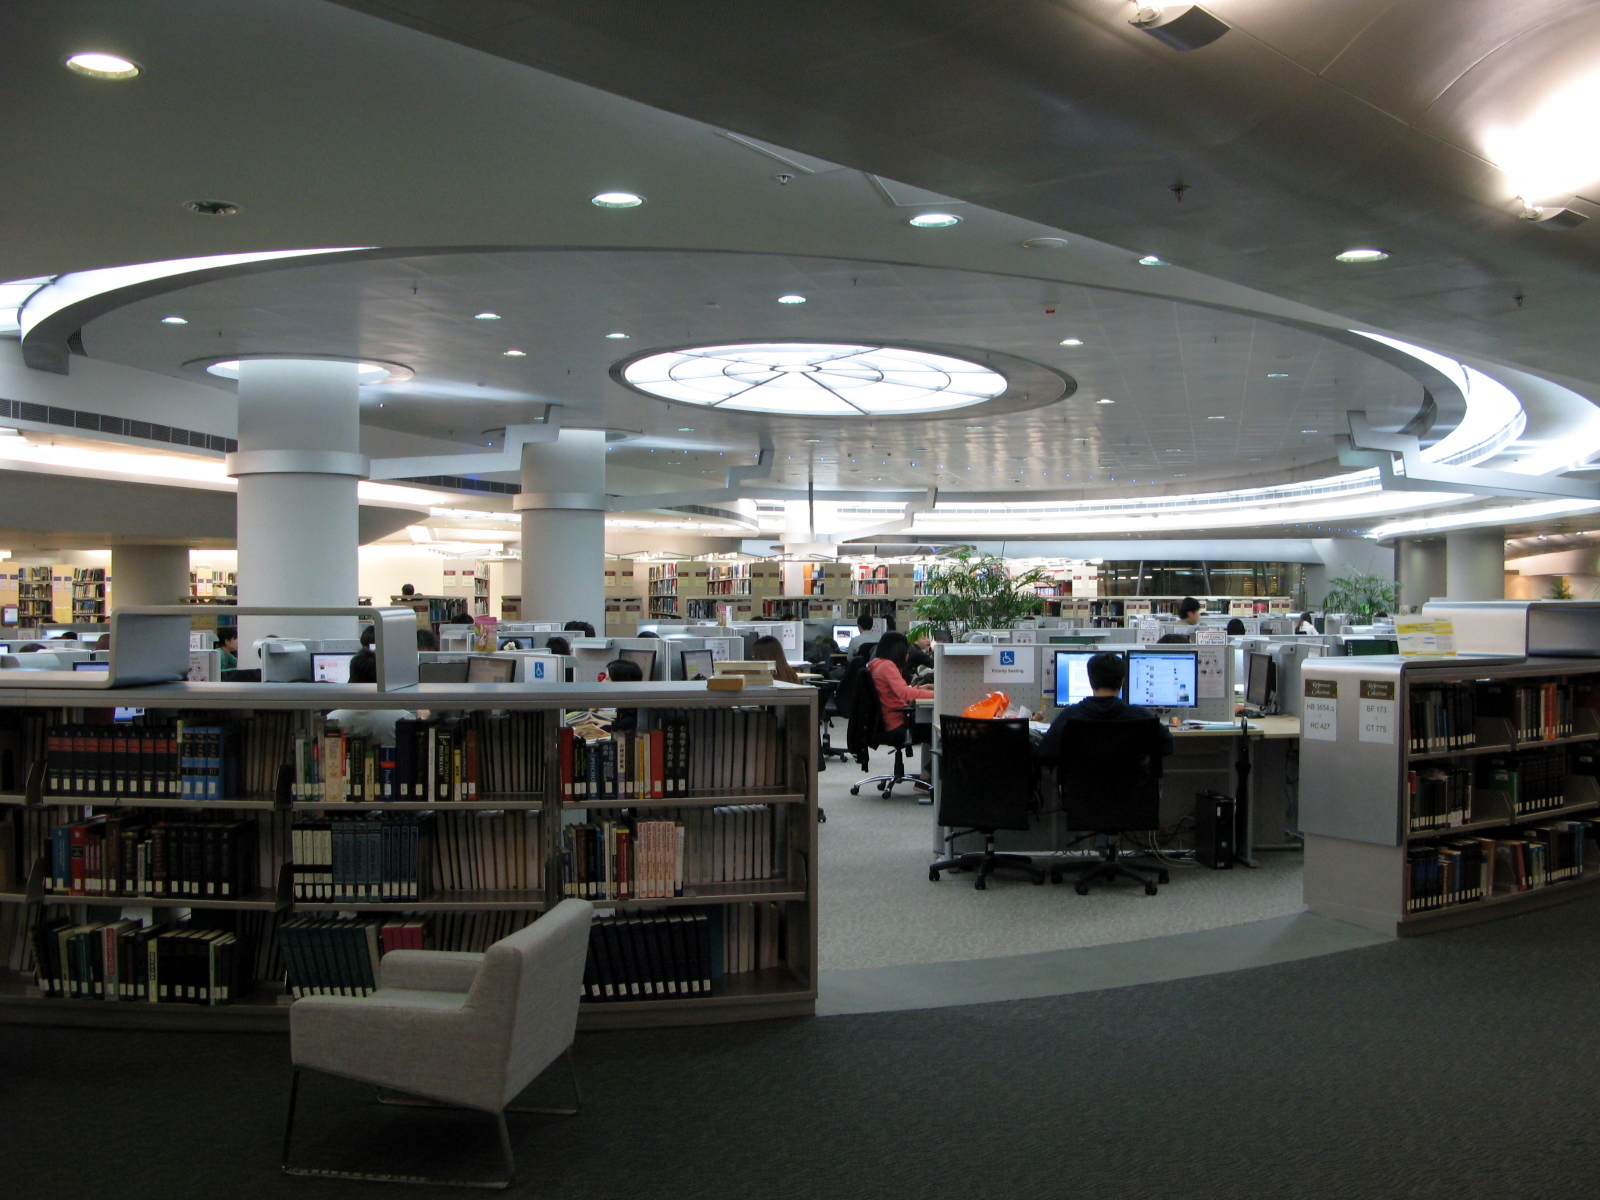 Polyu Design Building